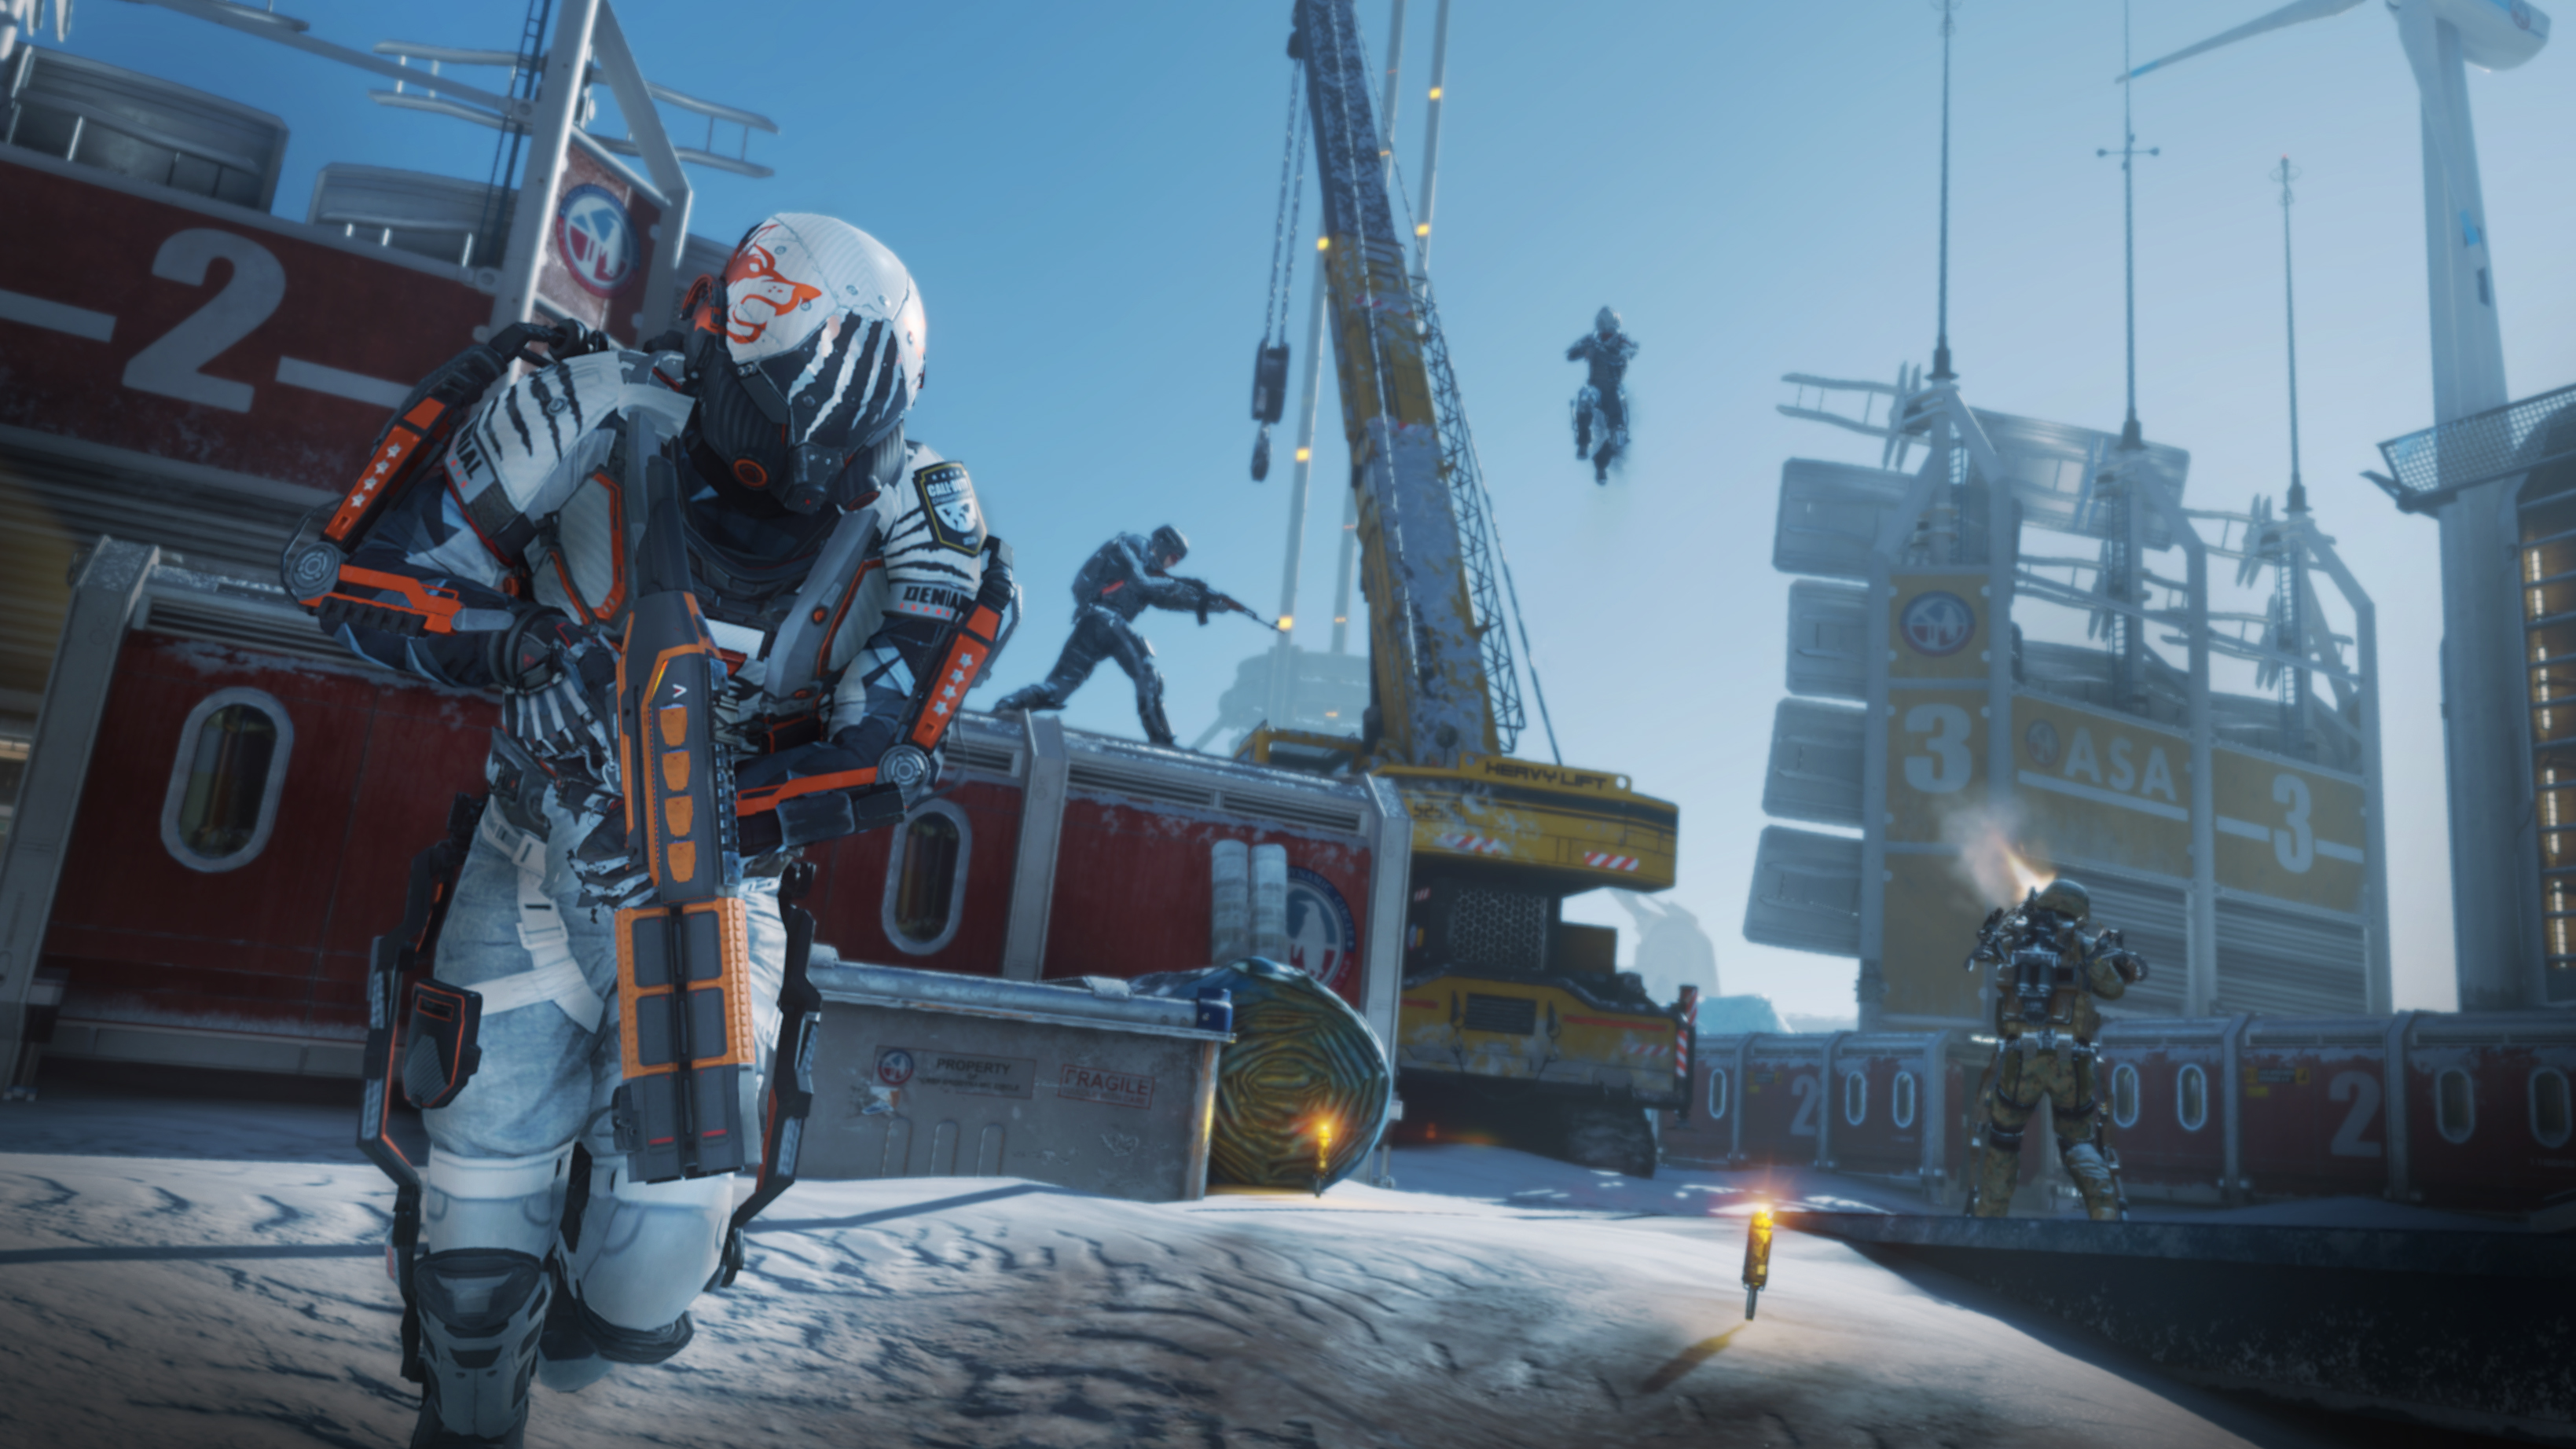 Call Of Duty Advanced Warfare Reckoning DLC Gets Some New ... Call Of Duty Advanced Warfare Dlc Map Packs on